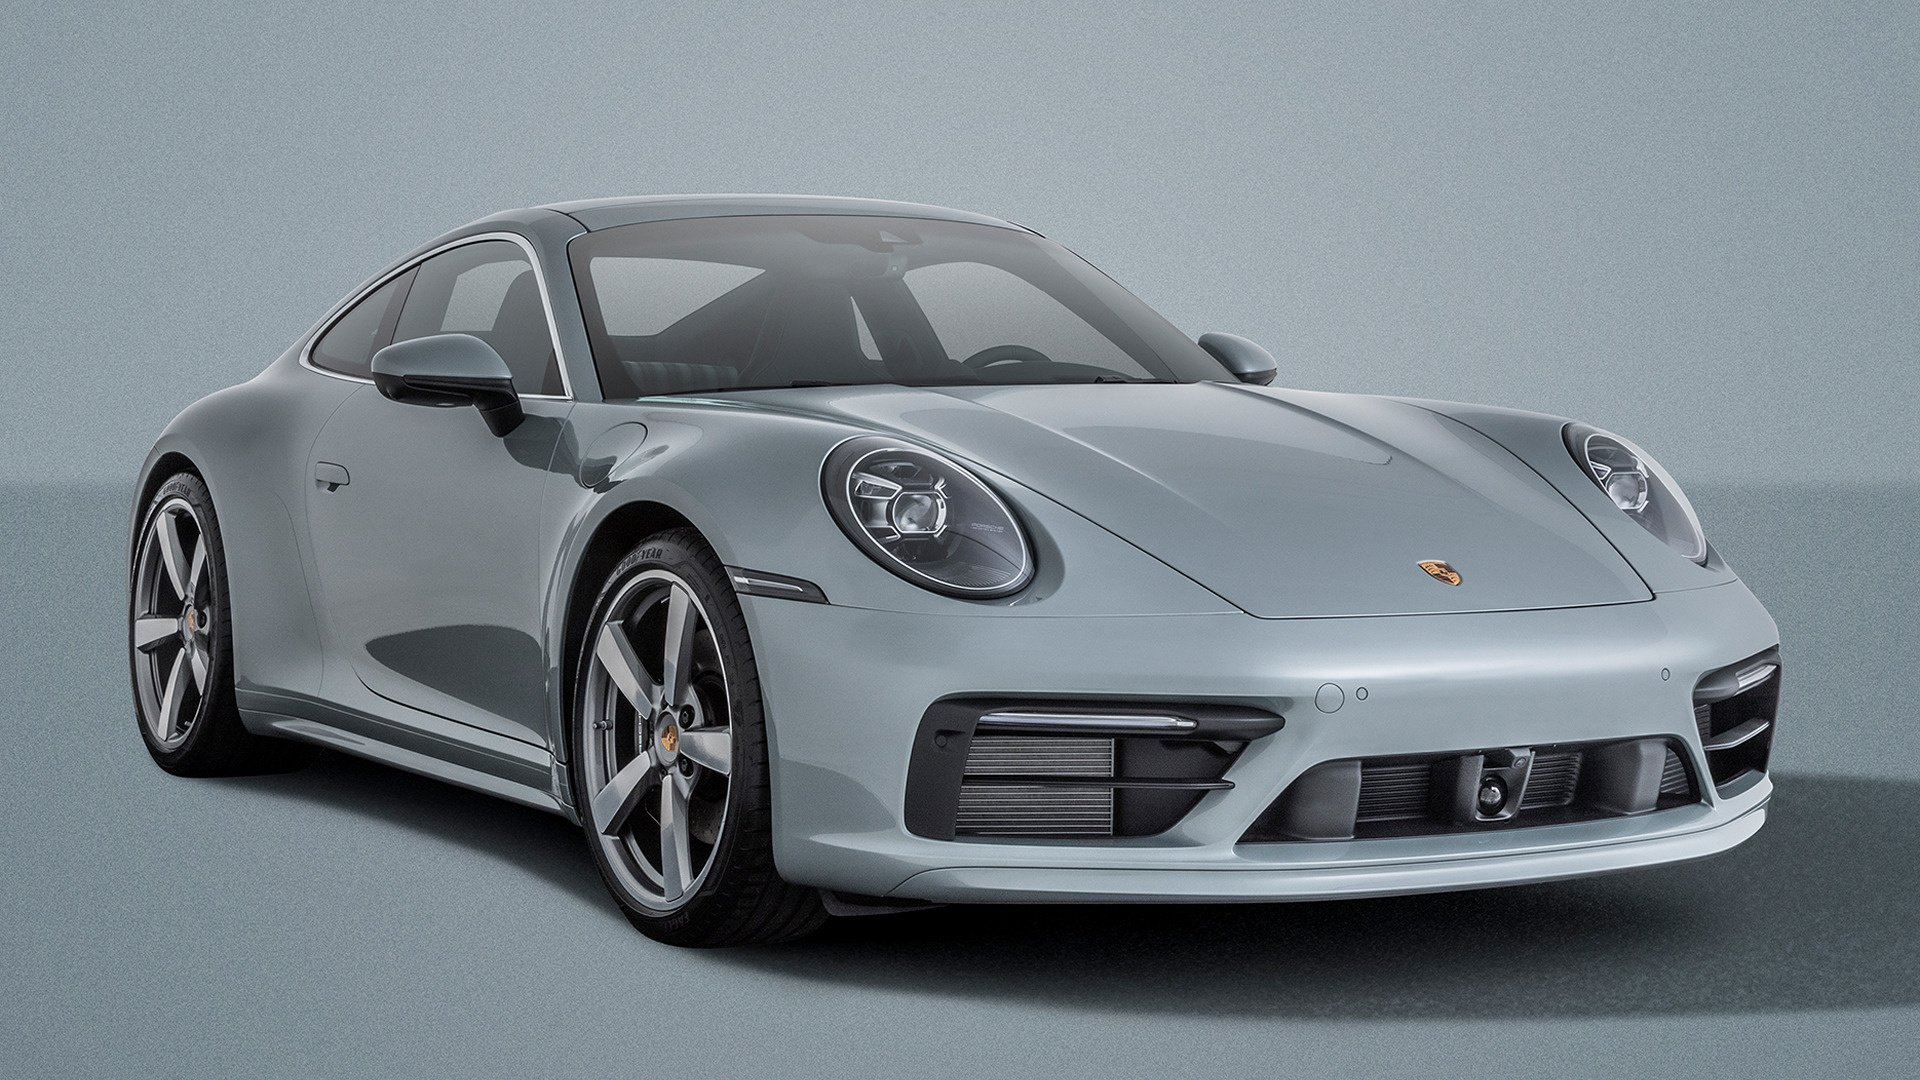 2019 Porsche 911992 Carrera S Ben Pon Jr Fondo De